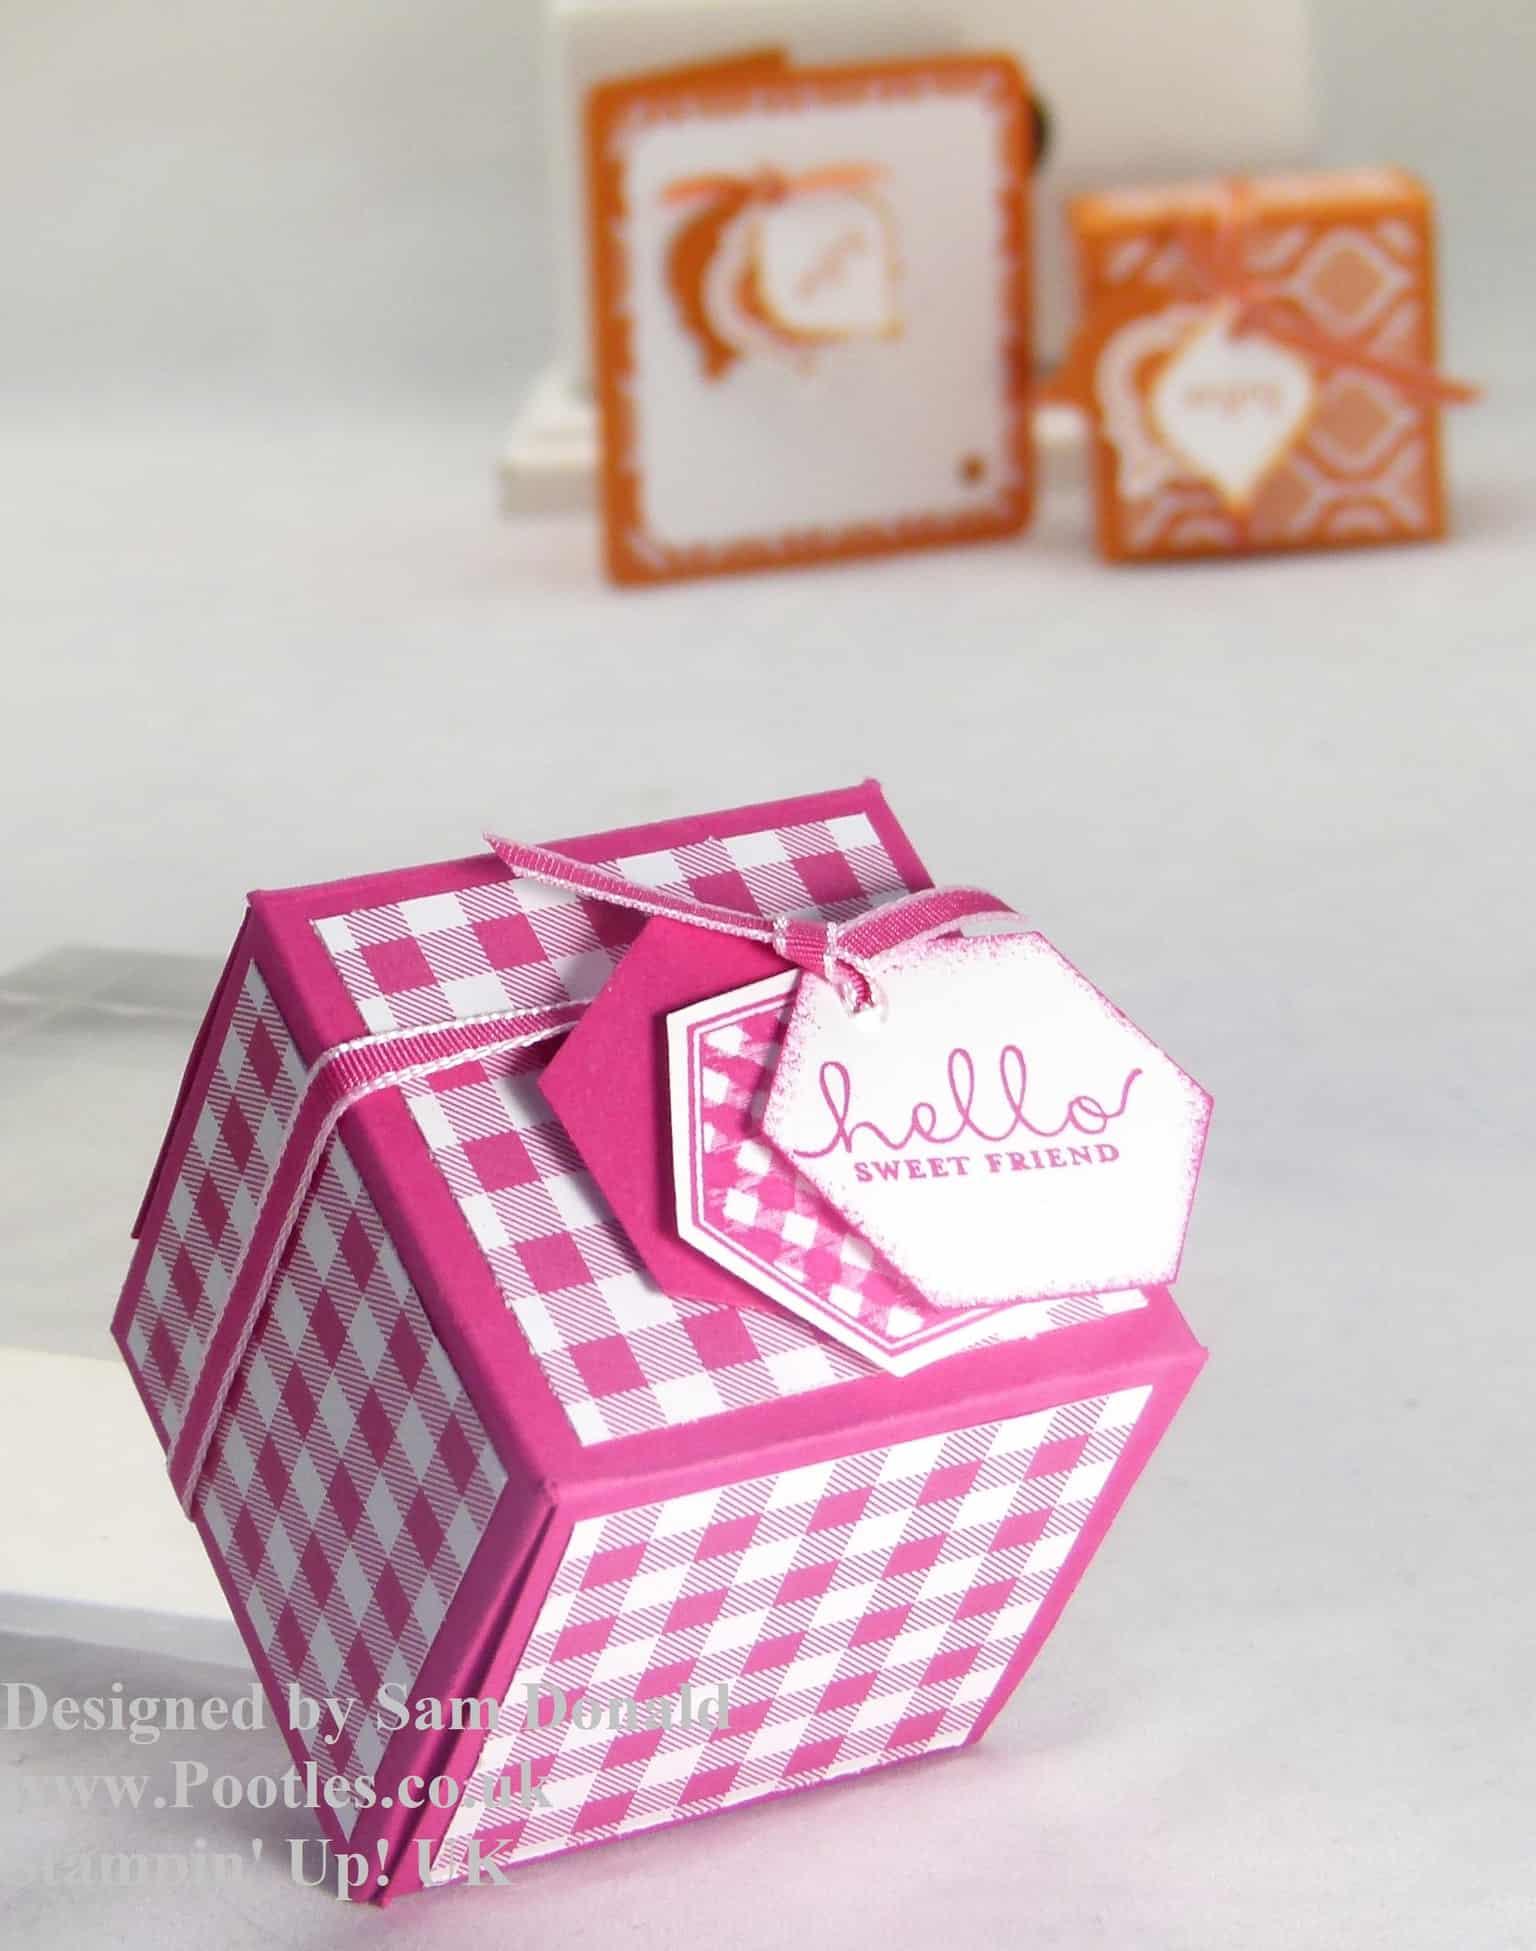 Pootles Stampin Up UK 2x2x2 Cube Fold Flat Favour Box 4